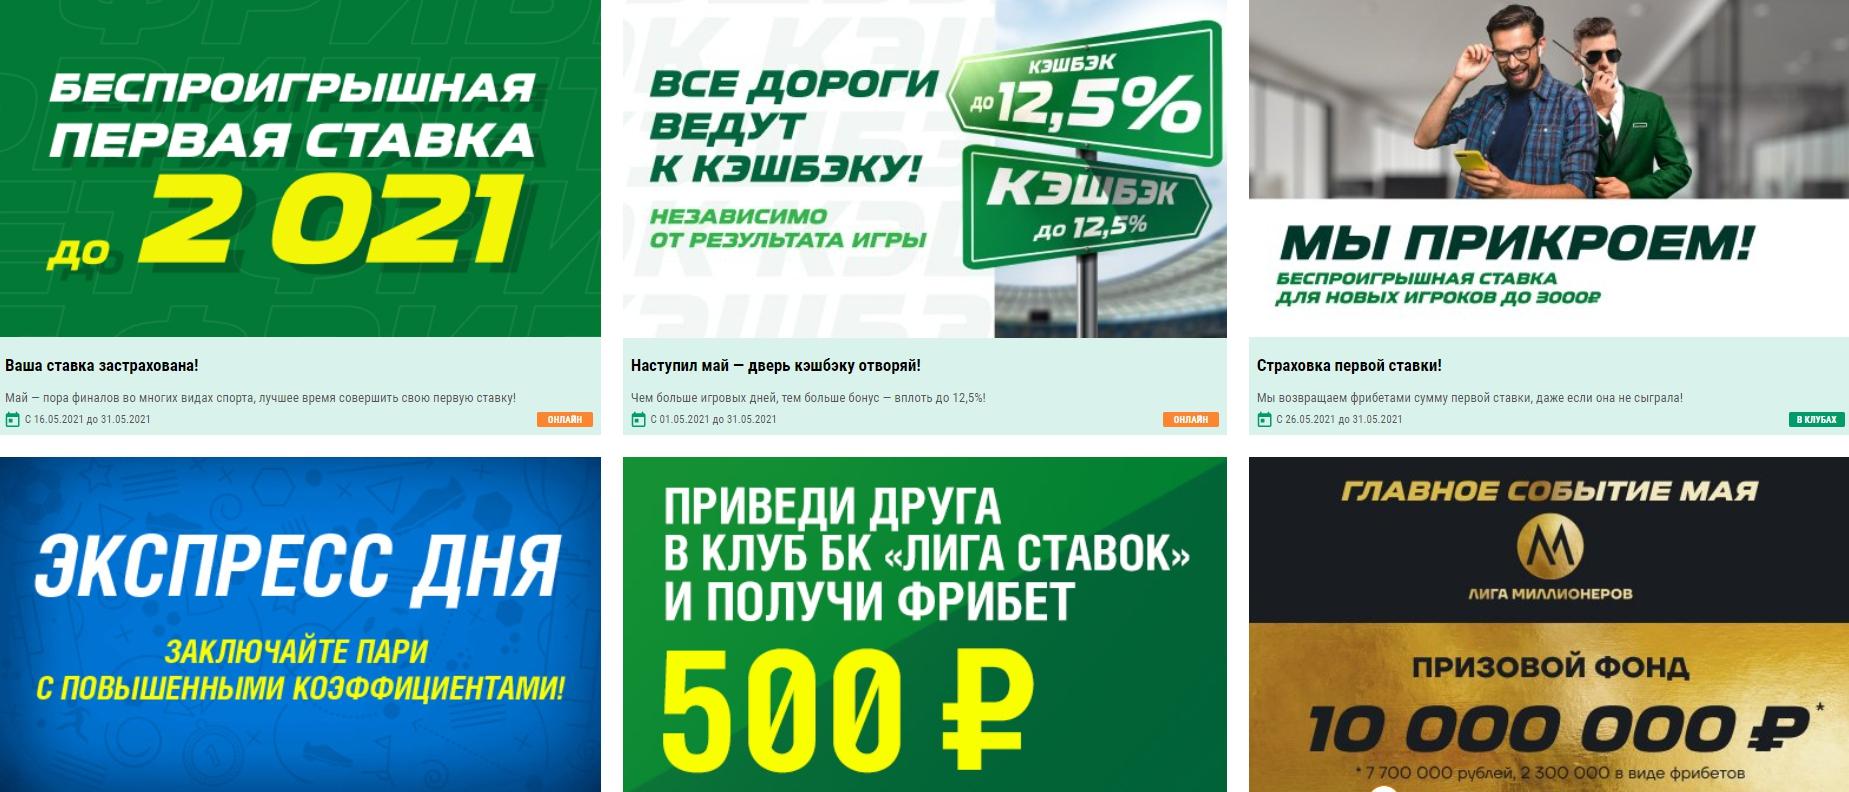 liga stavok aktsii i bonusy 2021 - изображение 8